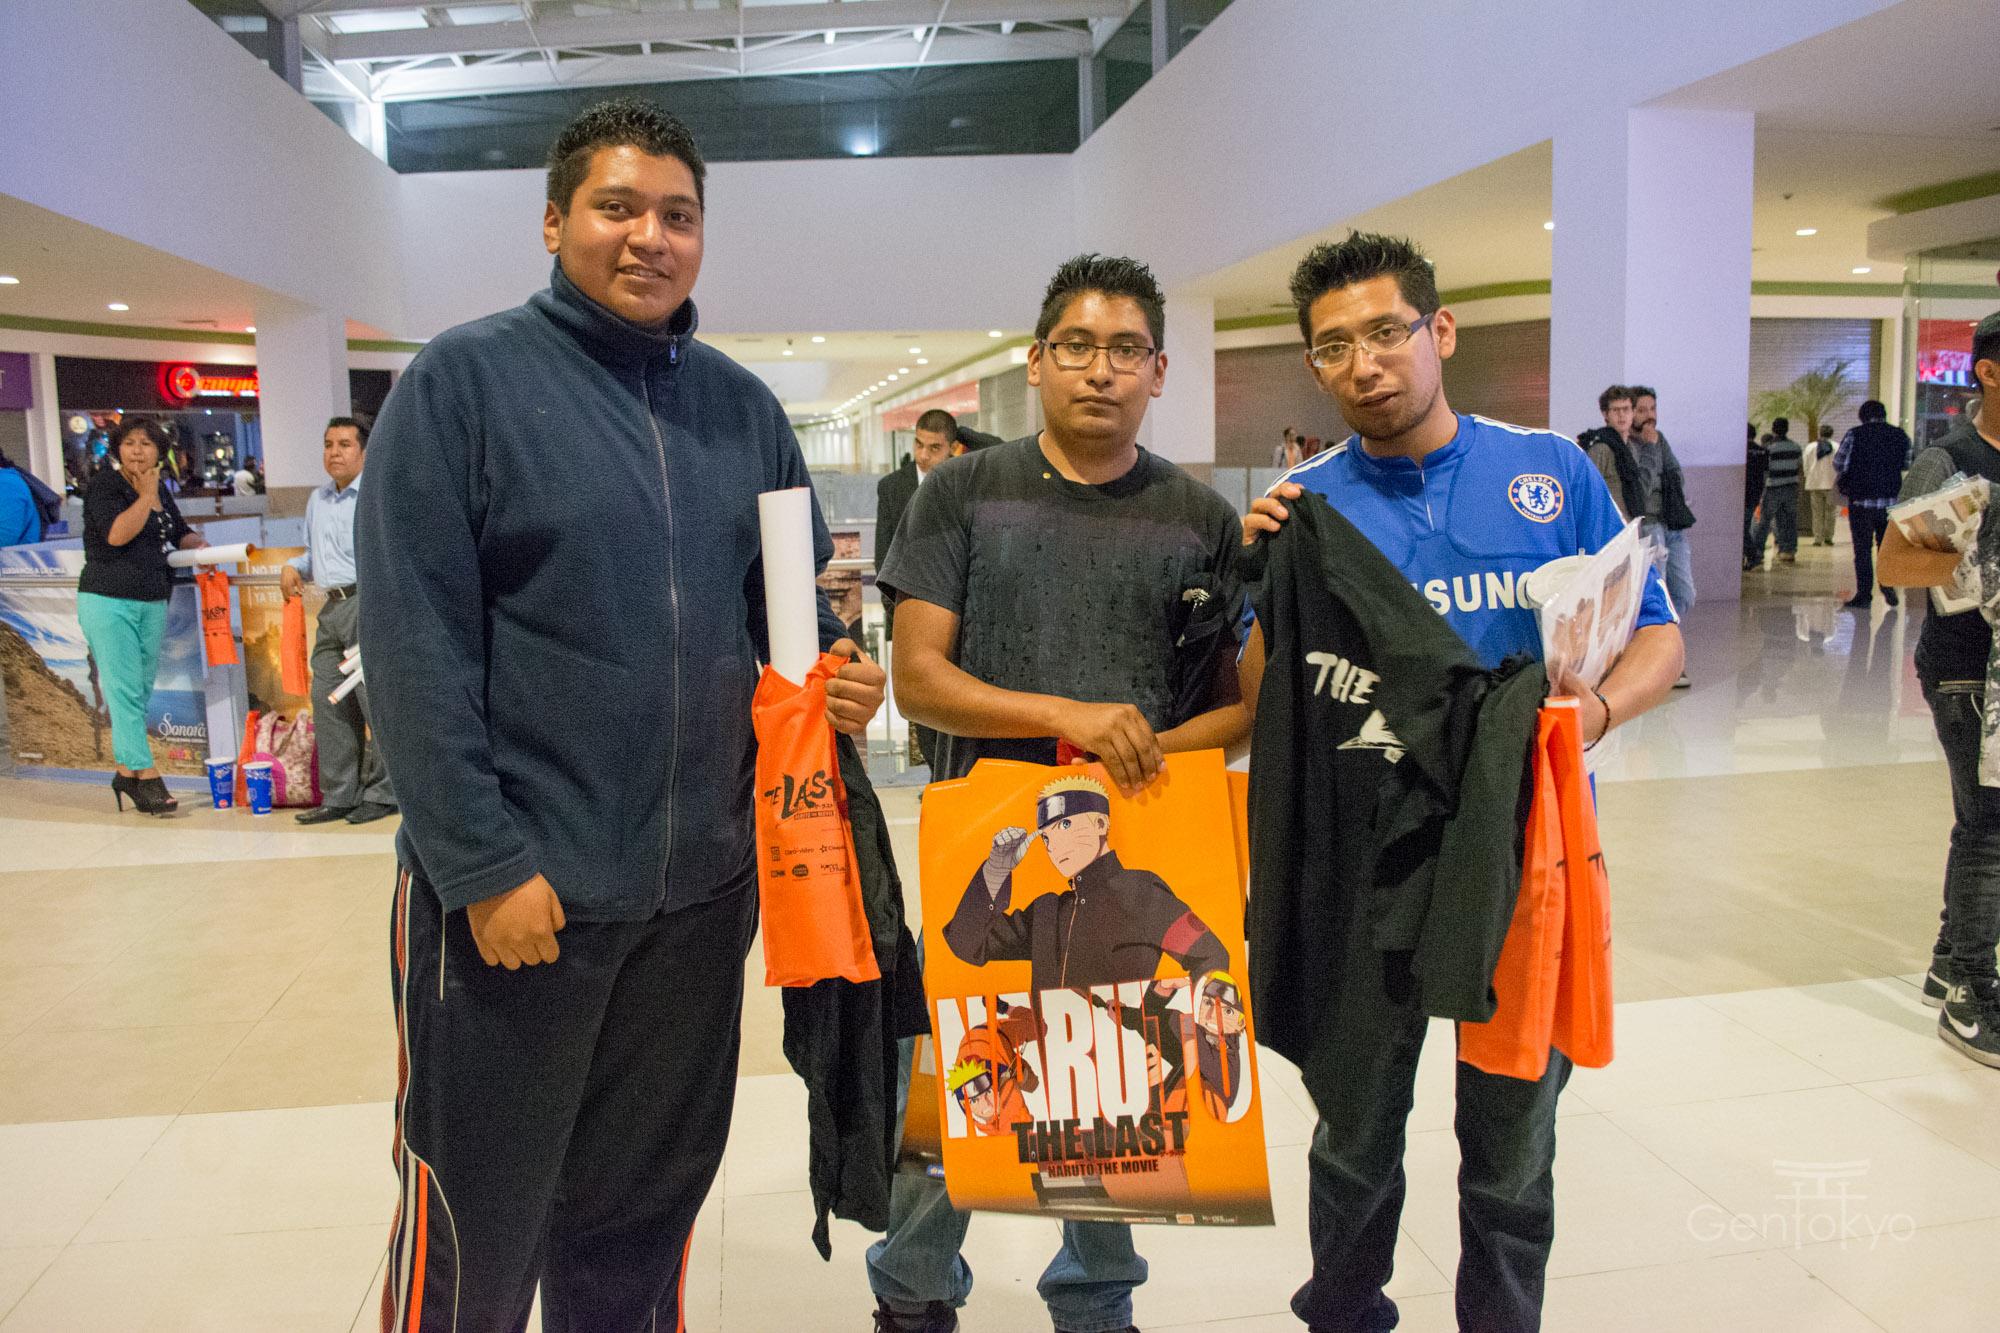 The-Last-Naruto-the-Movie-Mexico-34